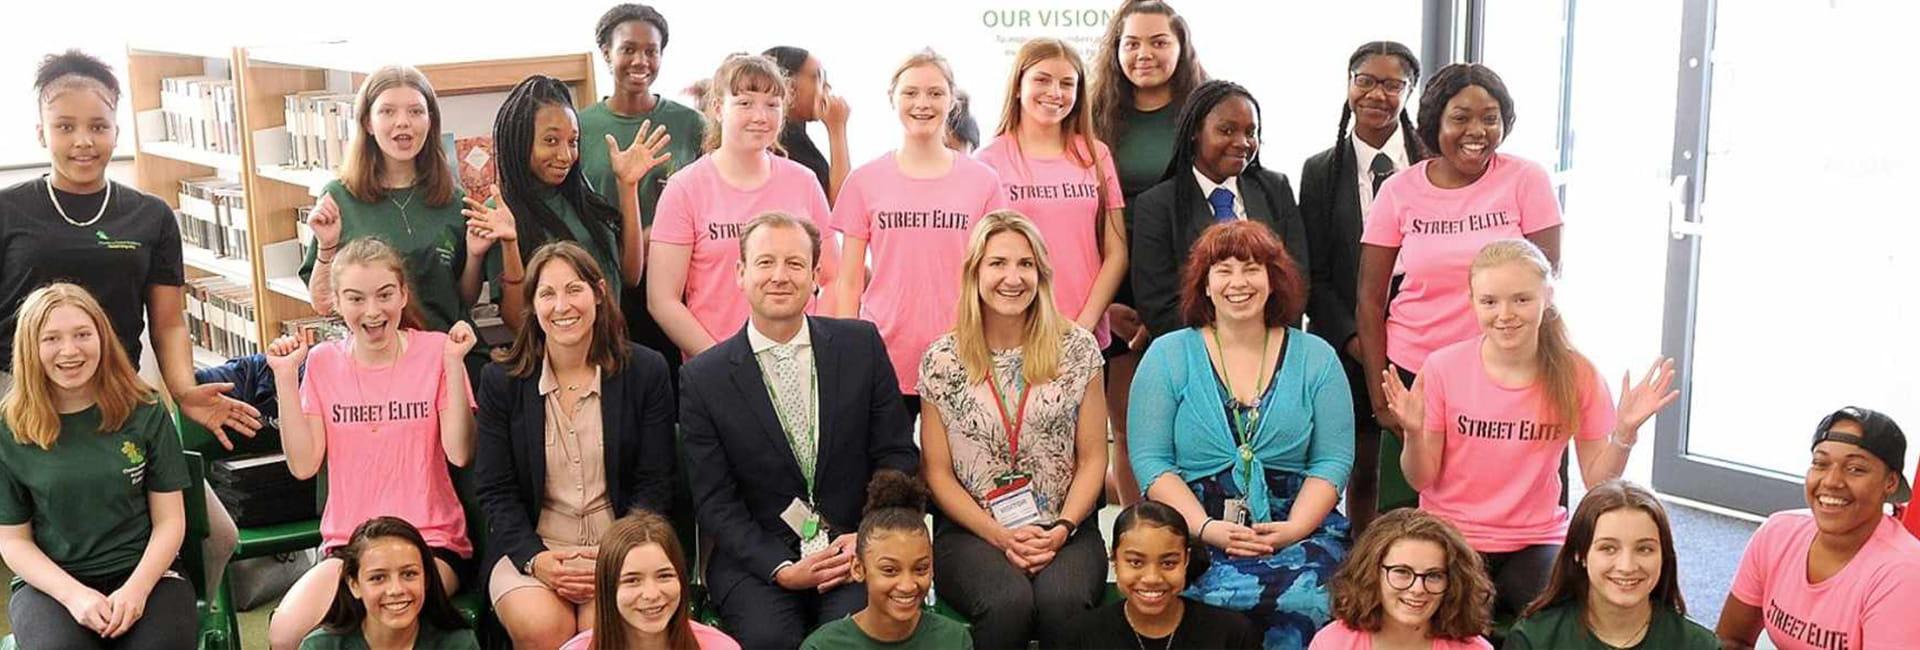 Bright Futures beckon for Street Elite Graduates | Berkeley Foundation